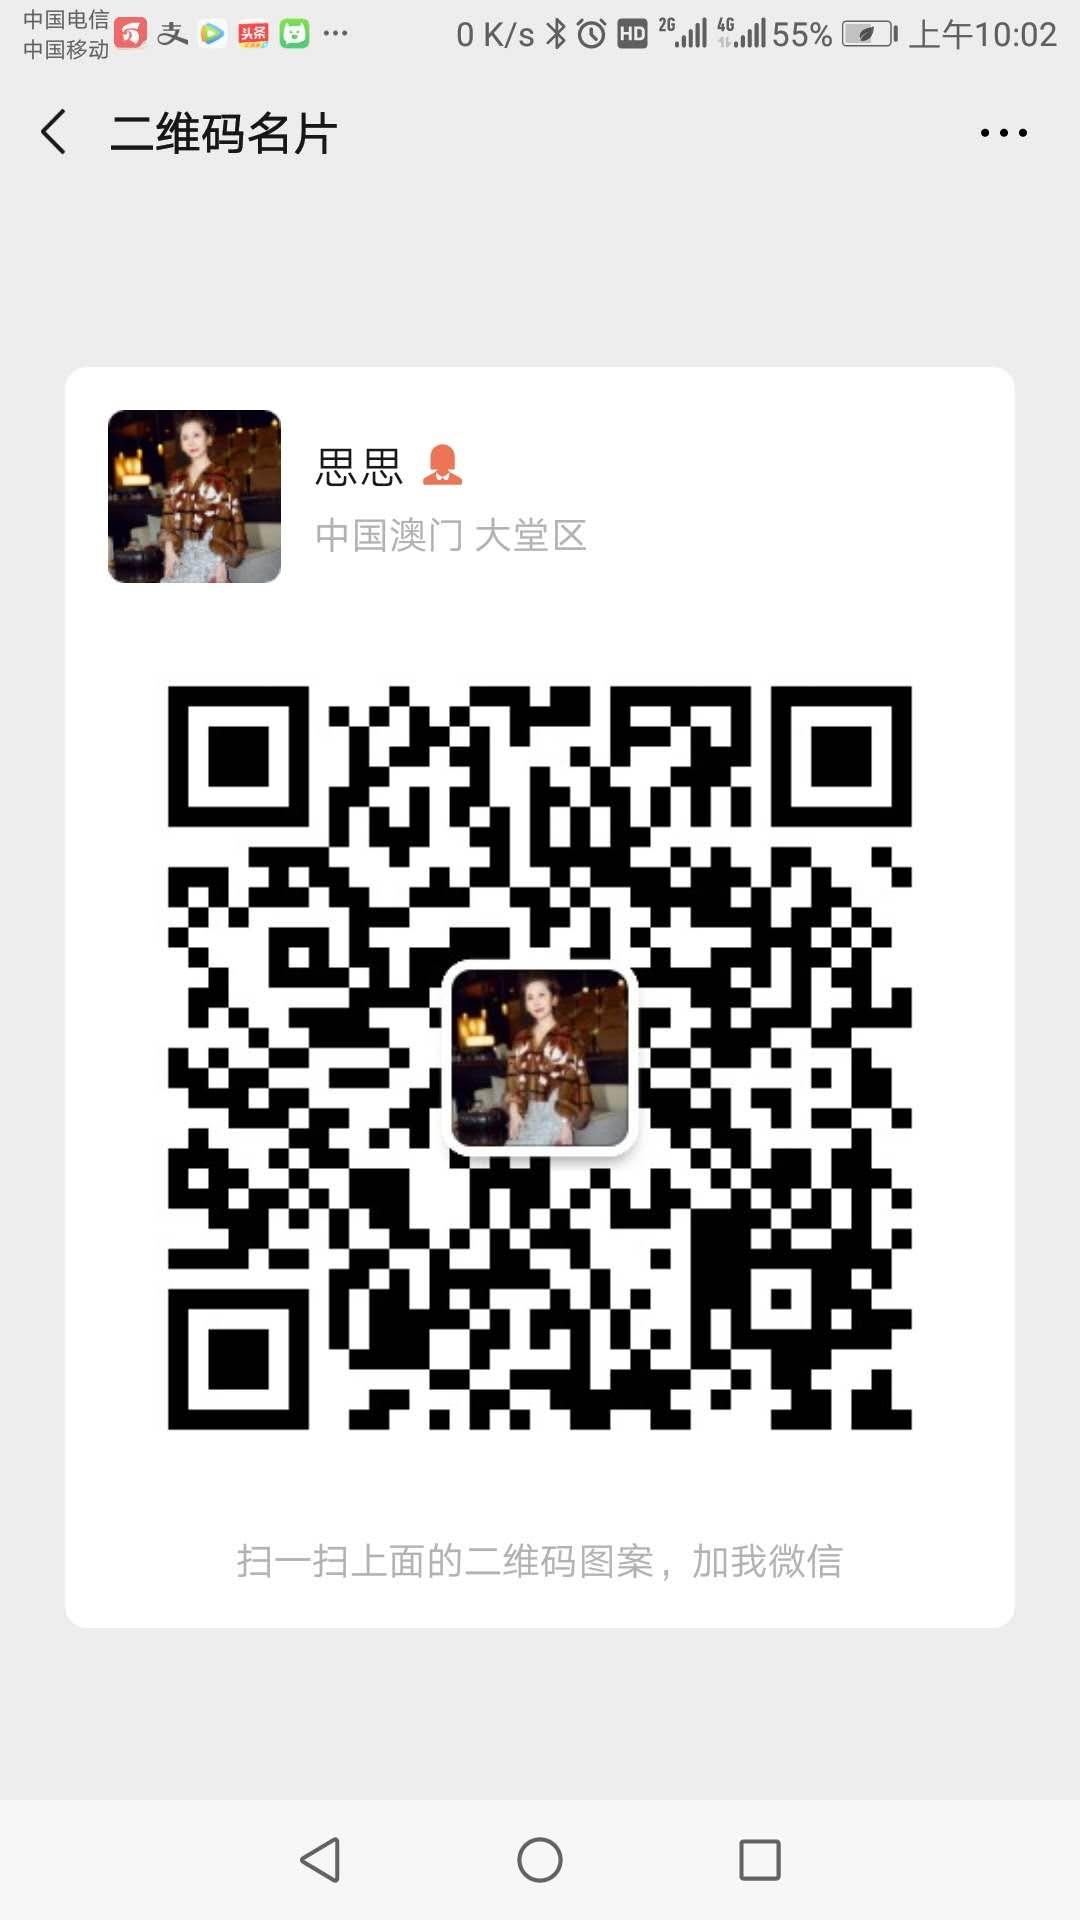 .\..\..\..\..\..\..\AppData\Local\Temp\WeChat Files\c4401b79380f6a691ecaad878e48f9f6_.jpg